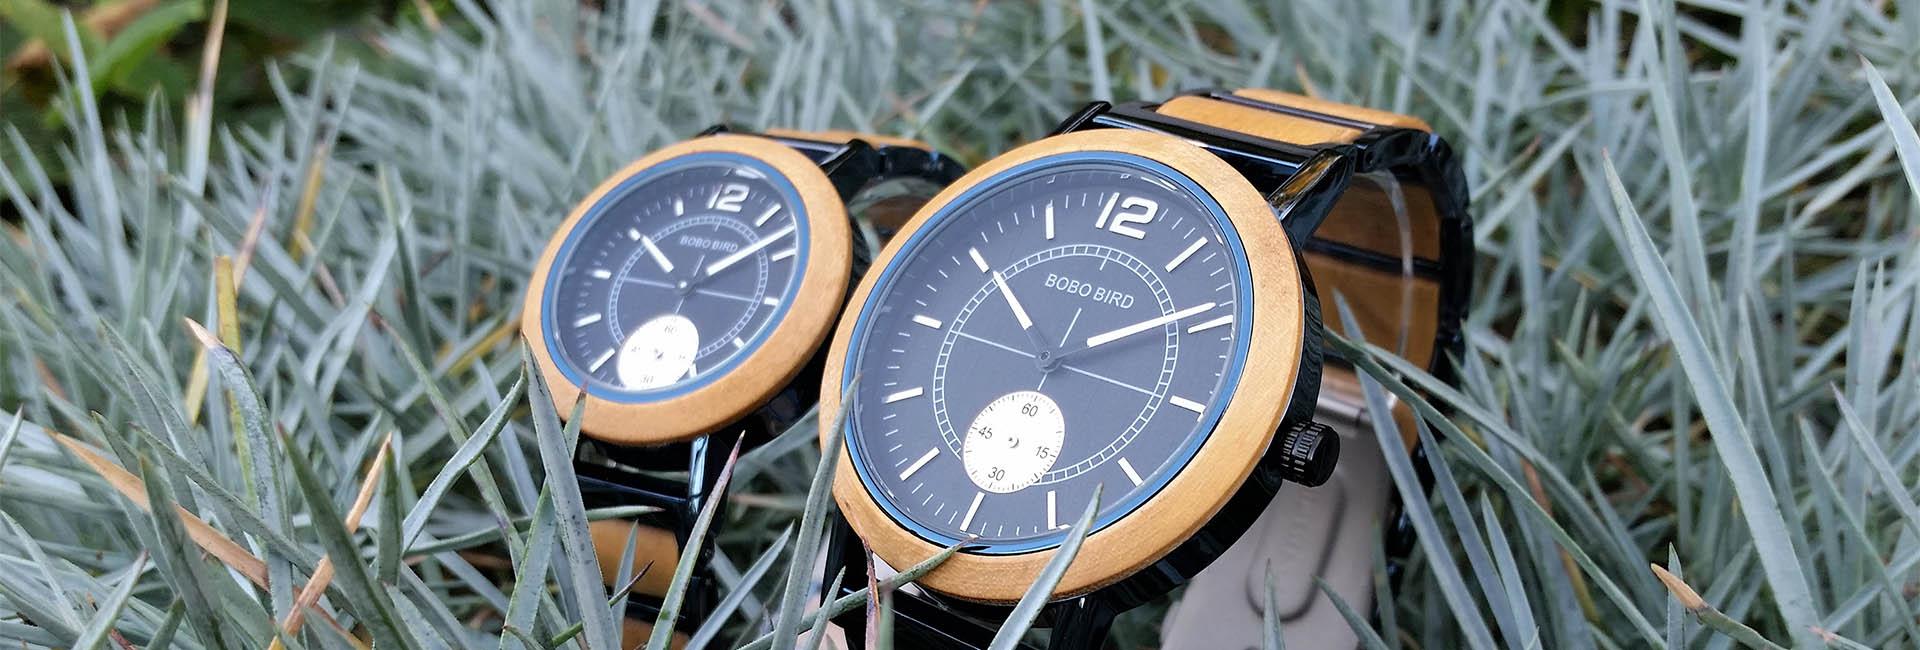 kategoria-drevene-hodinky-pre-pary-vini